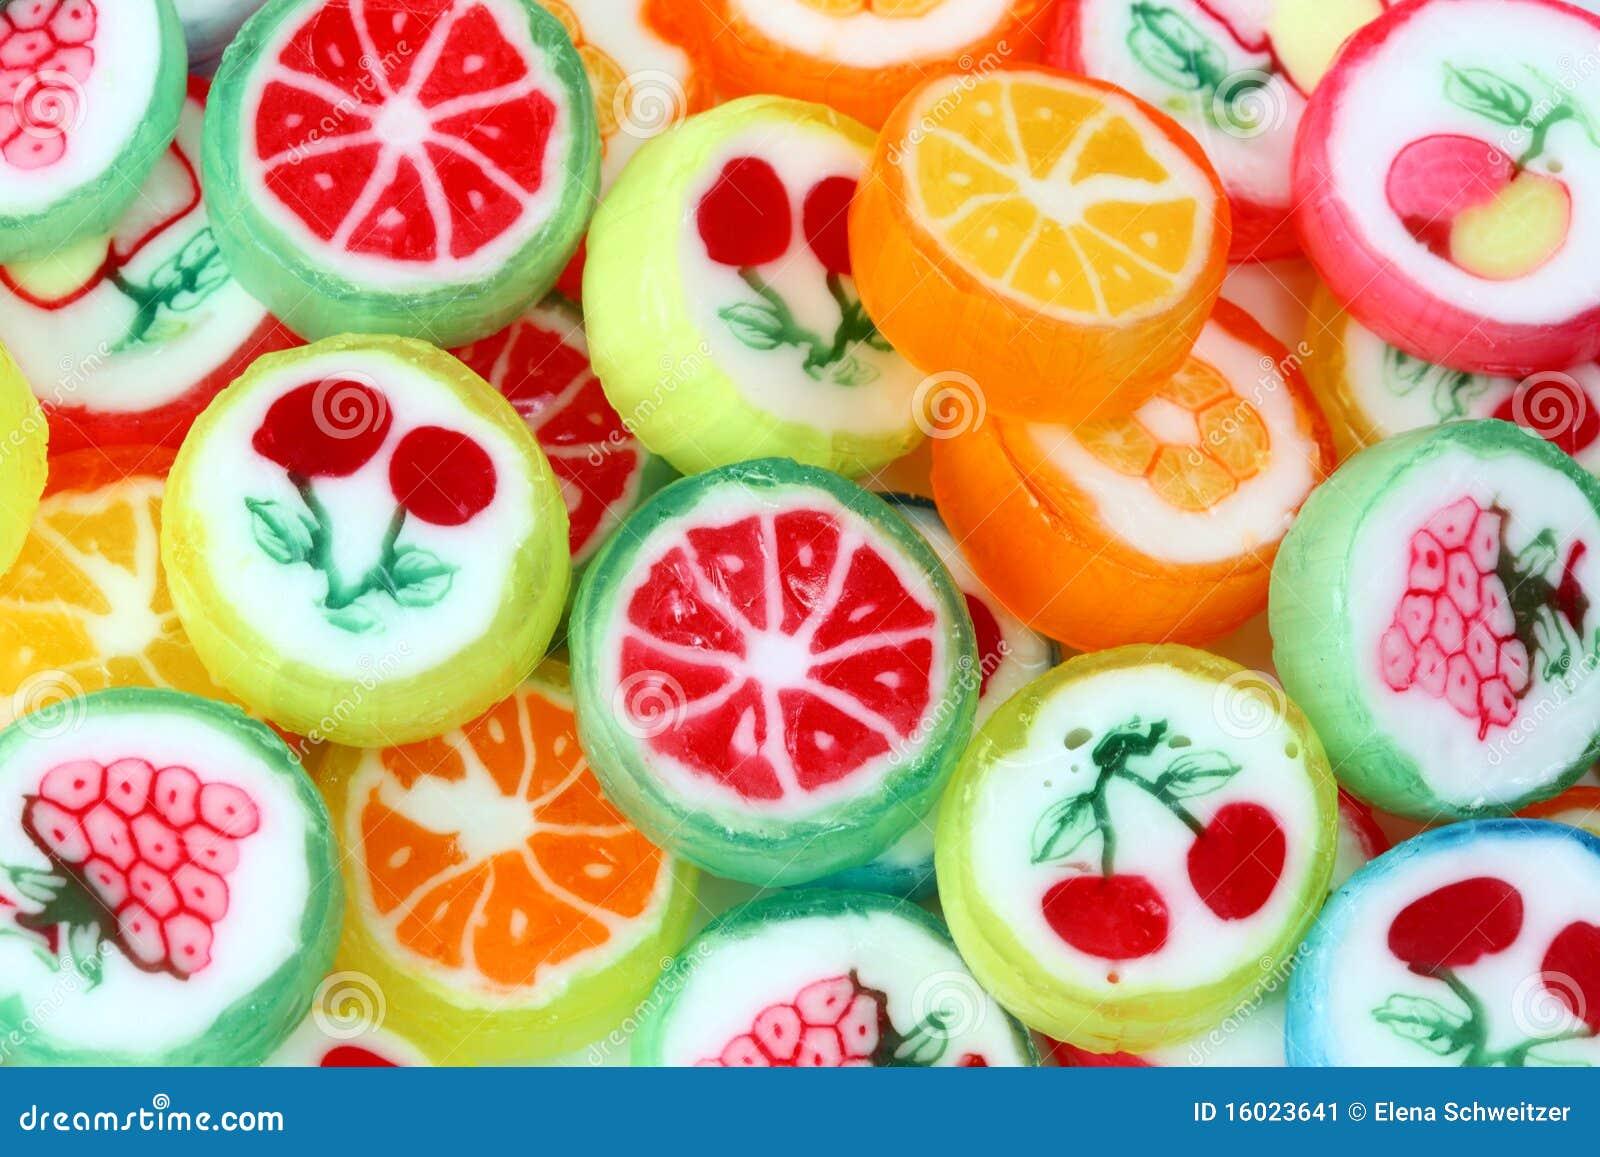 Favori Mixed Colorful Fruit Bonbon Stock Image - Image: 16023641 MM29